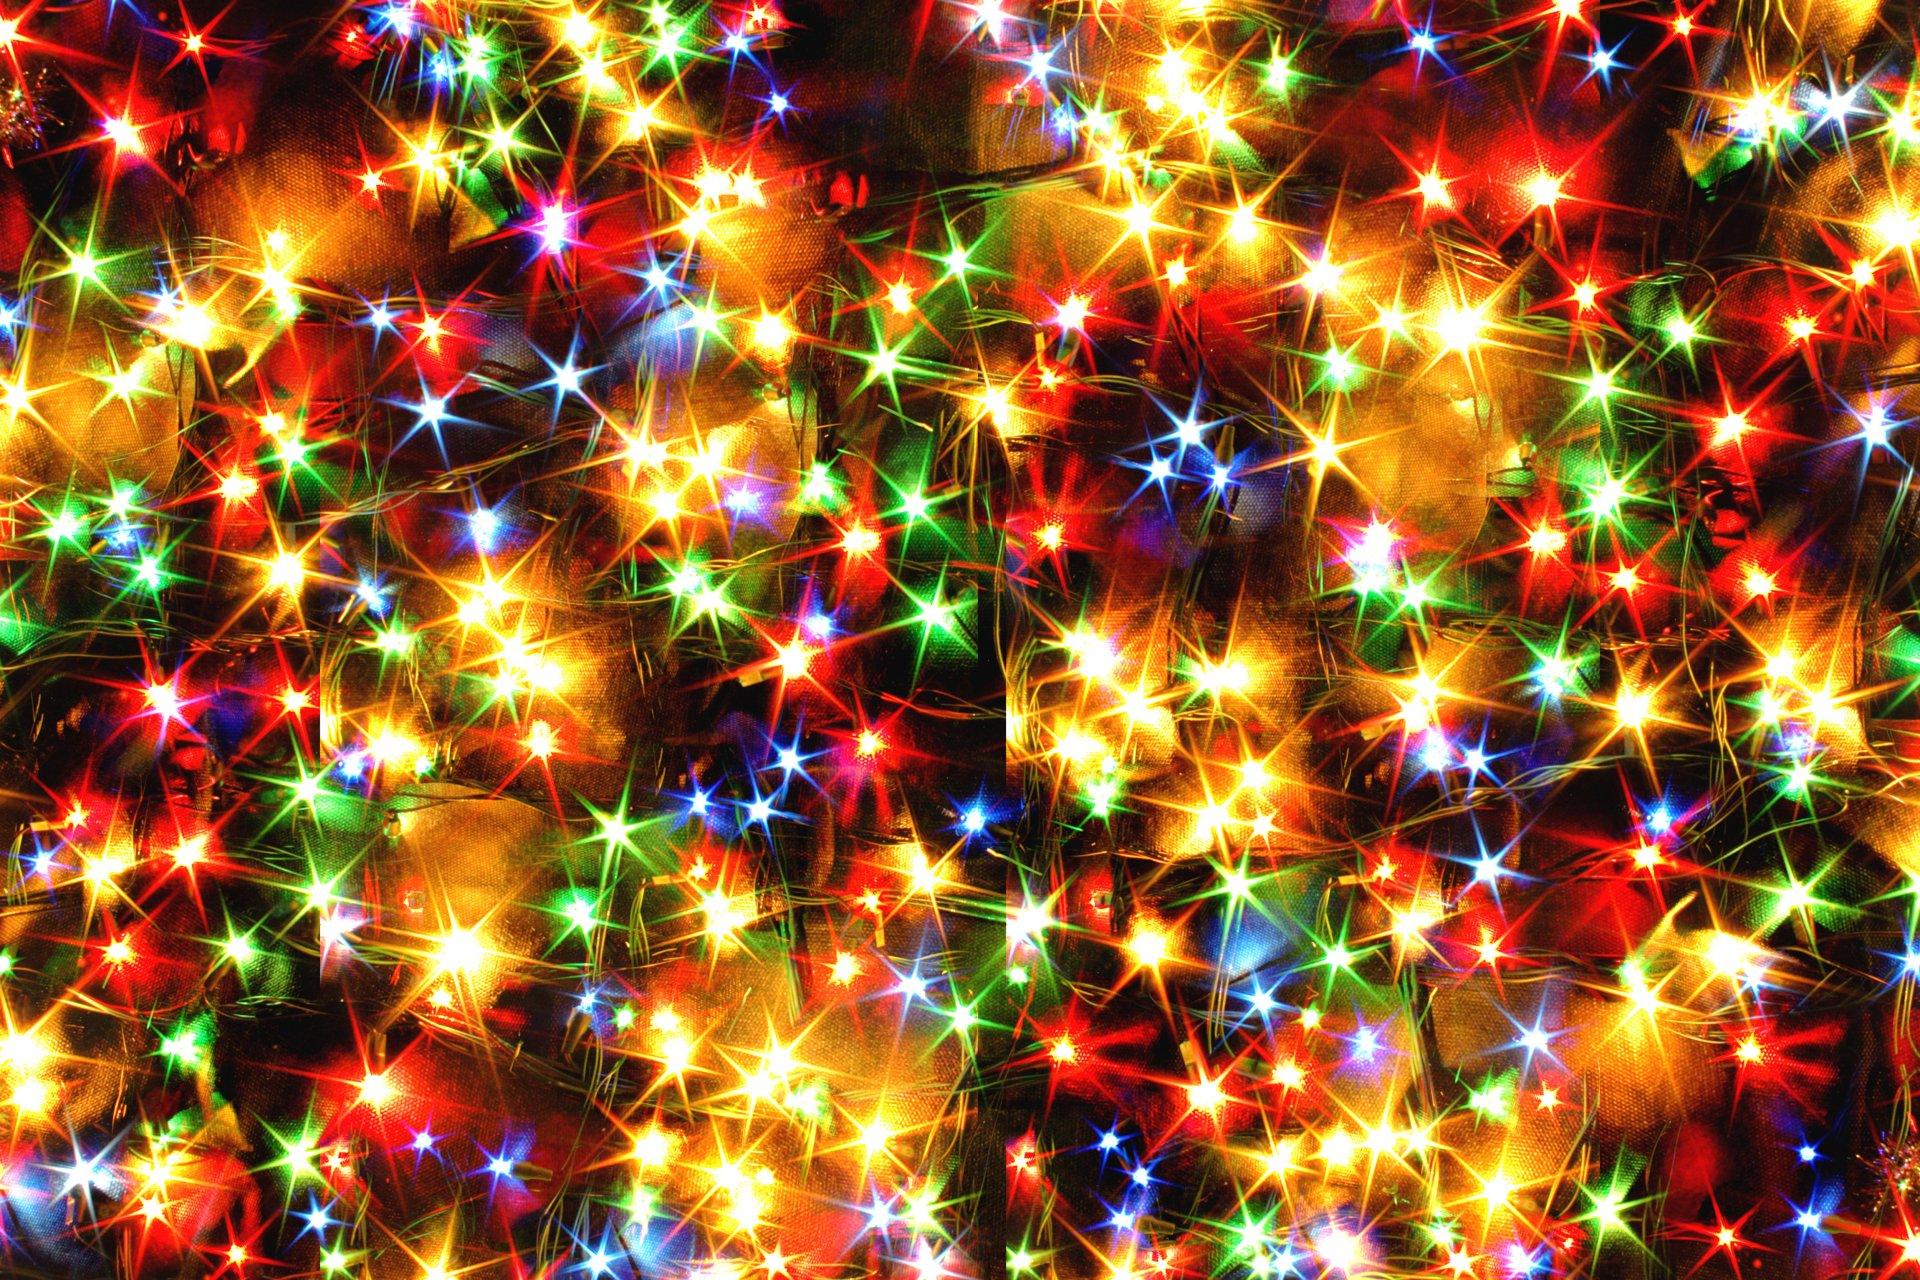 Christmas Lights 4k Ultra Hd Wallpaper Background Image